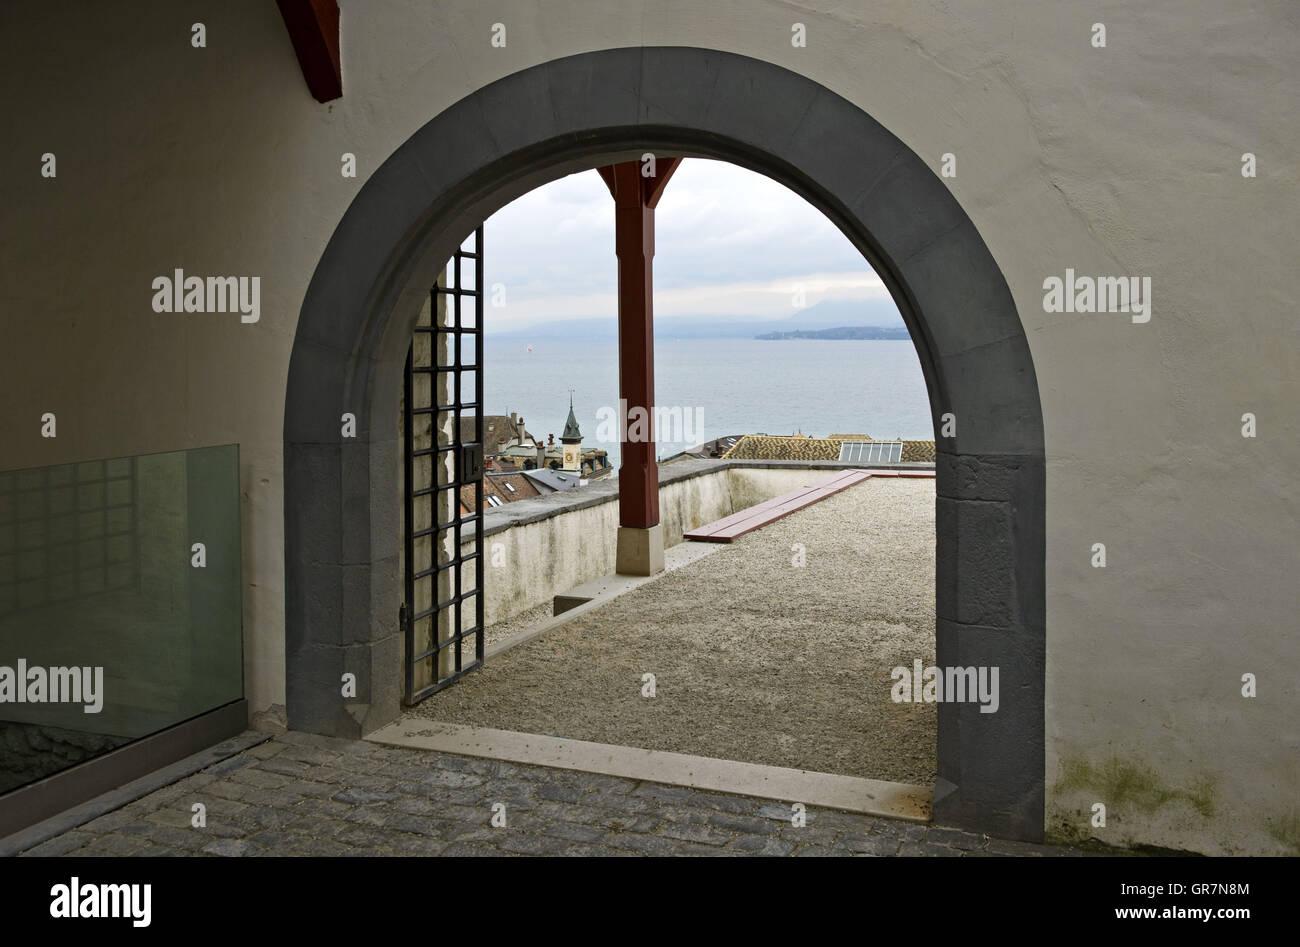 Portal Of The Nyon Castle, Château De Nyon, With View On Lake Geneva, Nyon, Vaud, Switzerland - Stock Image